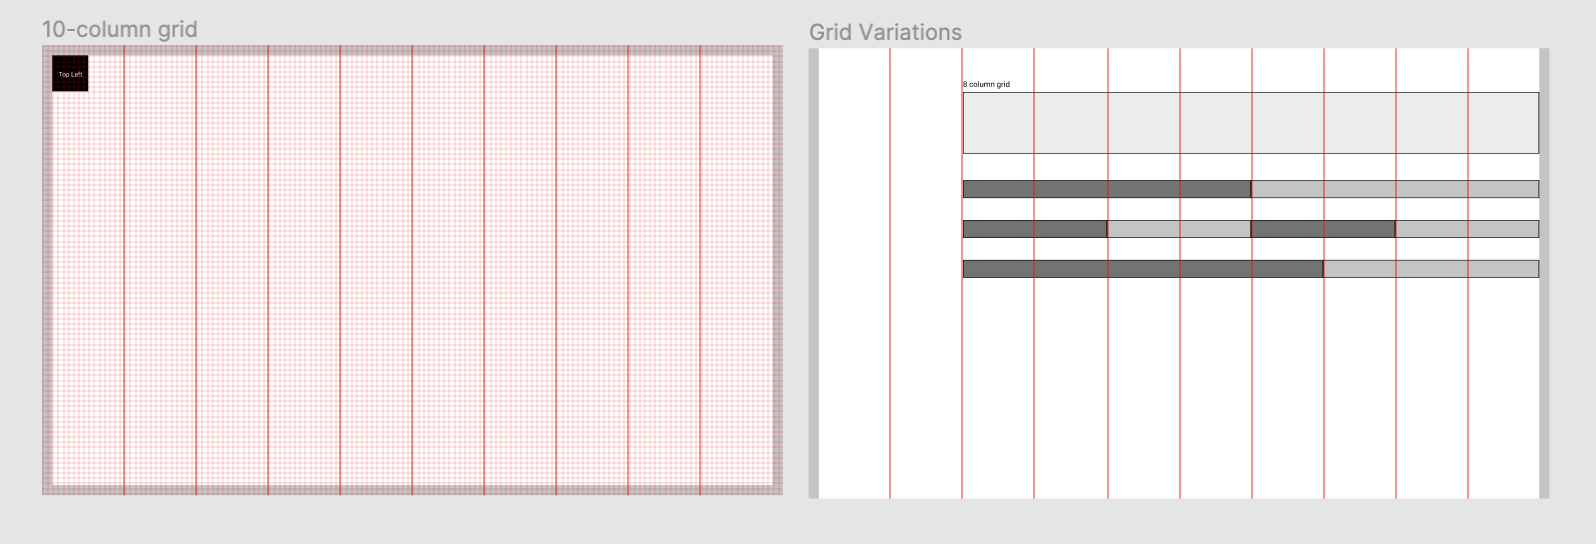 Establishing grid and spacing rules